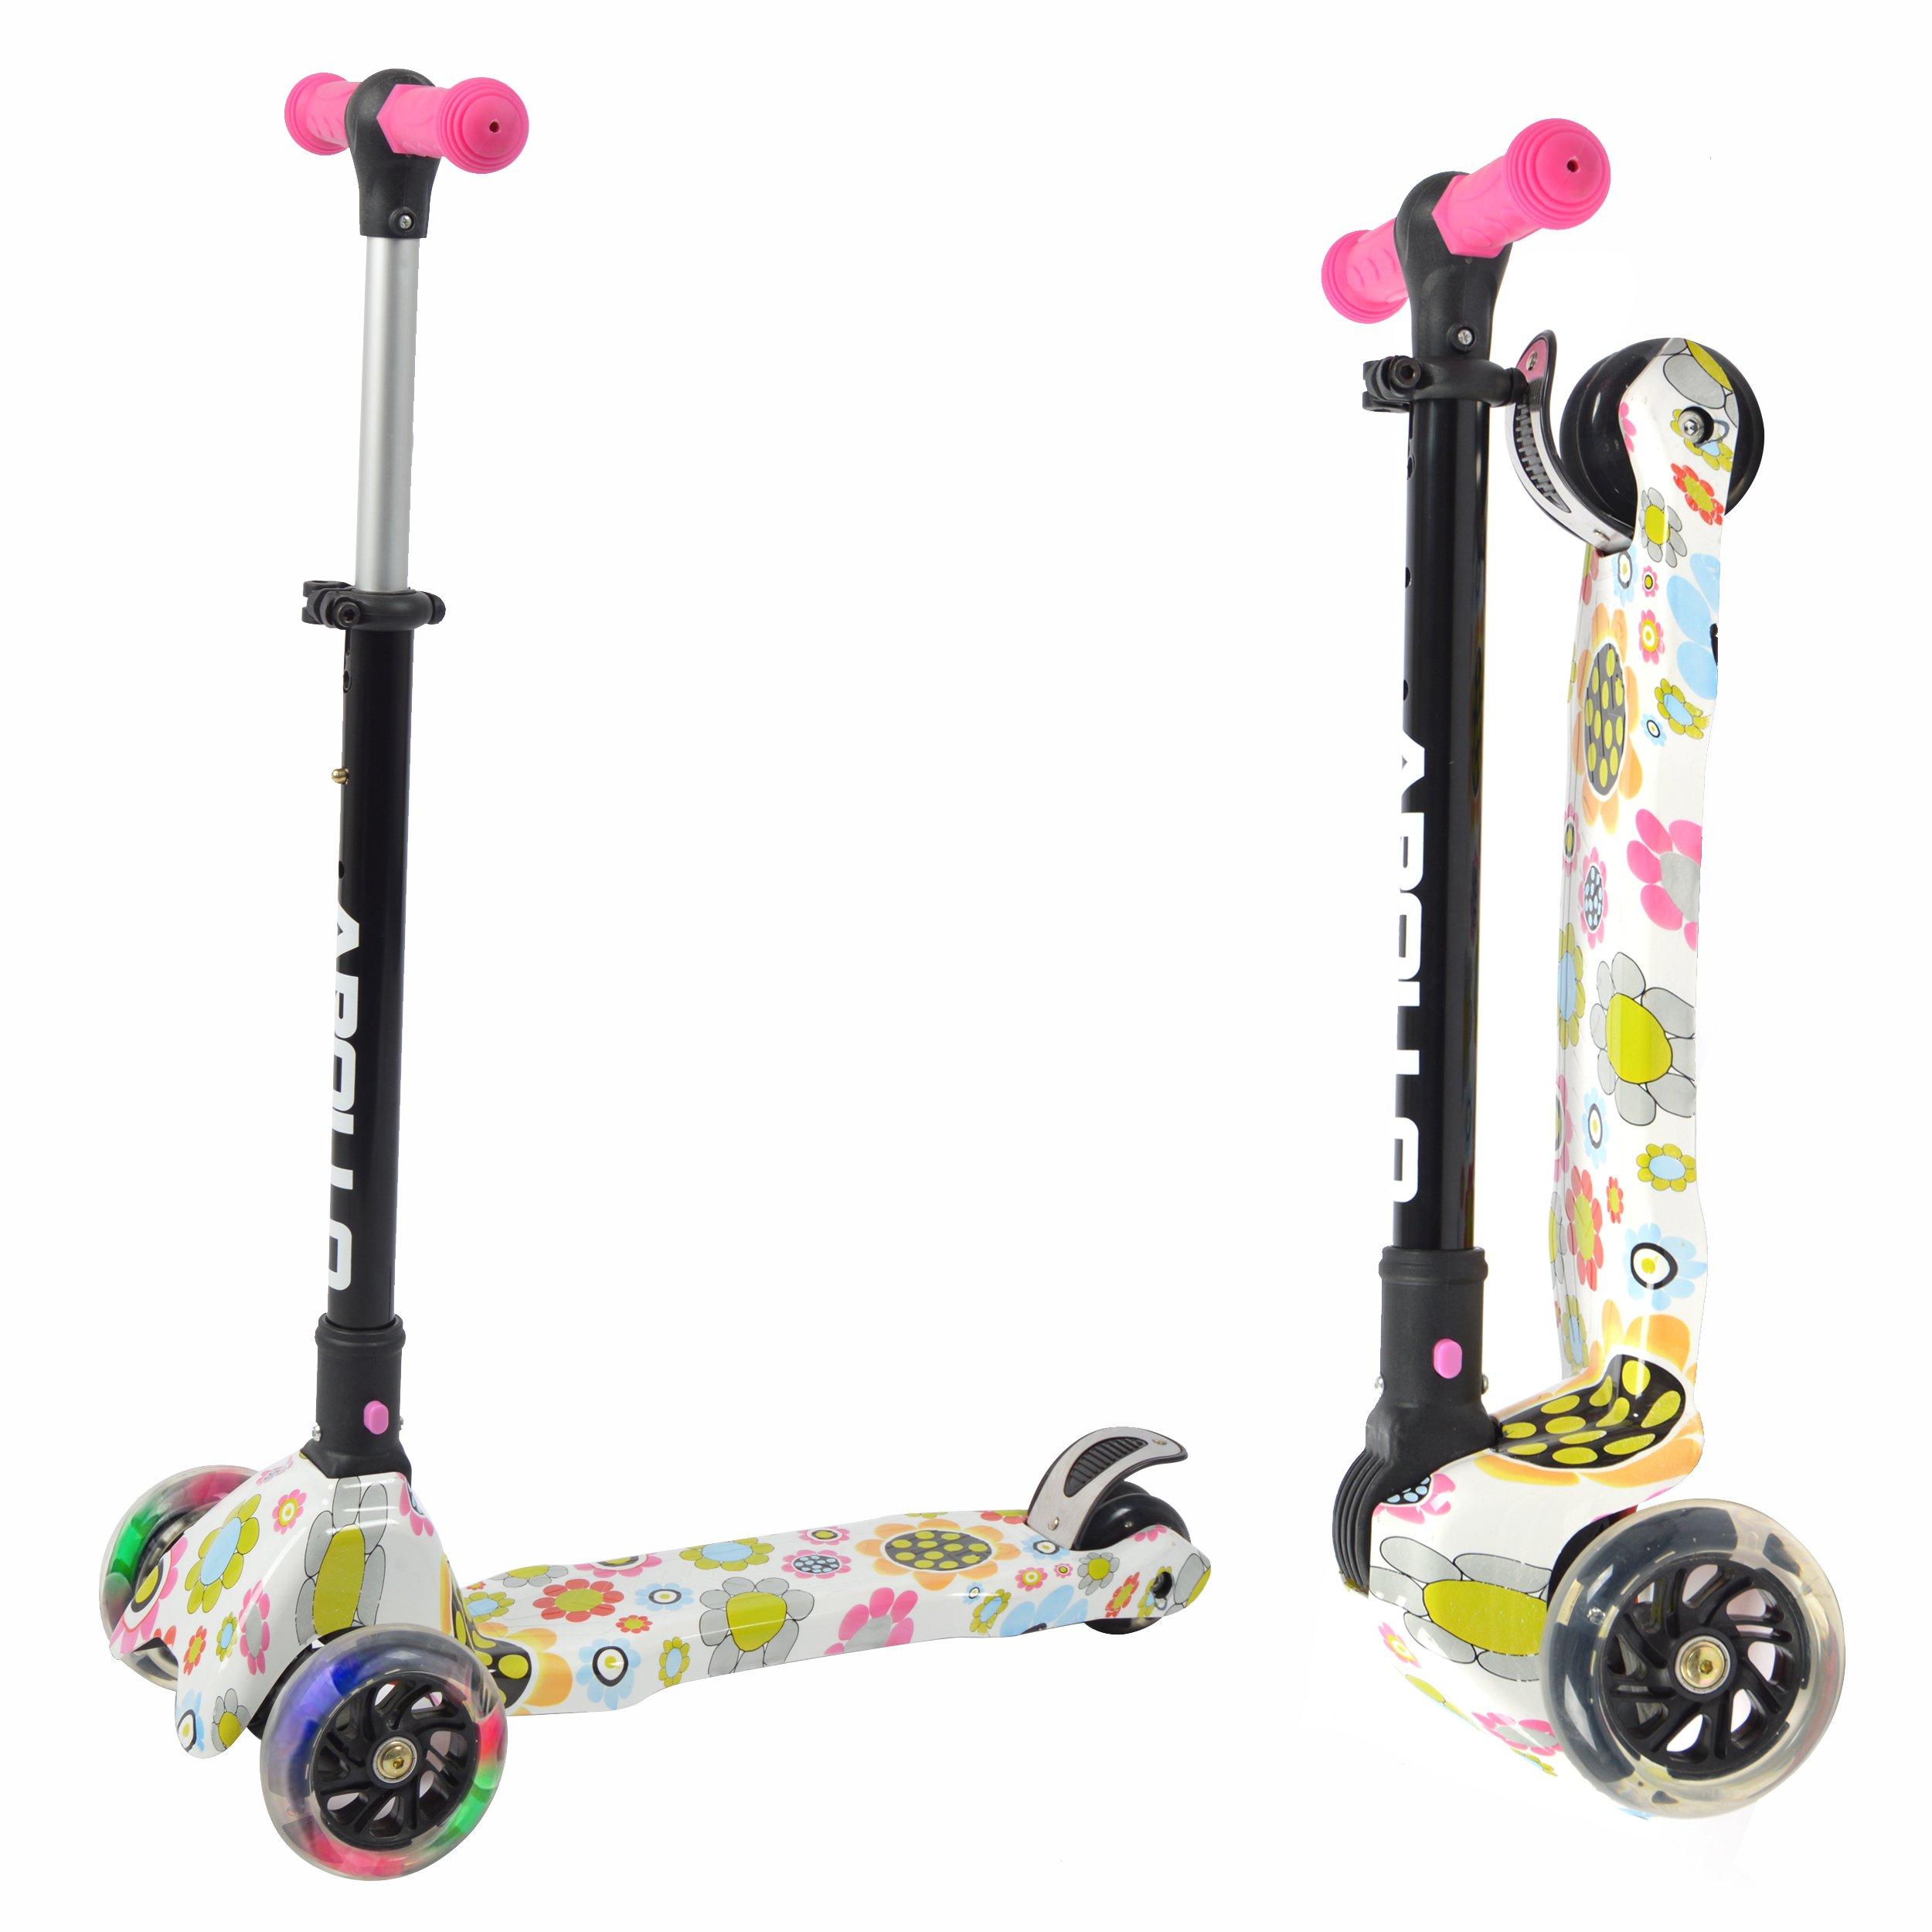 Apollo Scooter - Candy Racer LED - Big Wheel Scooter niños a Partir de 3 años, Kickboard-Scooter